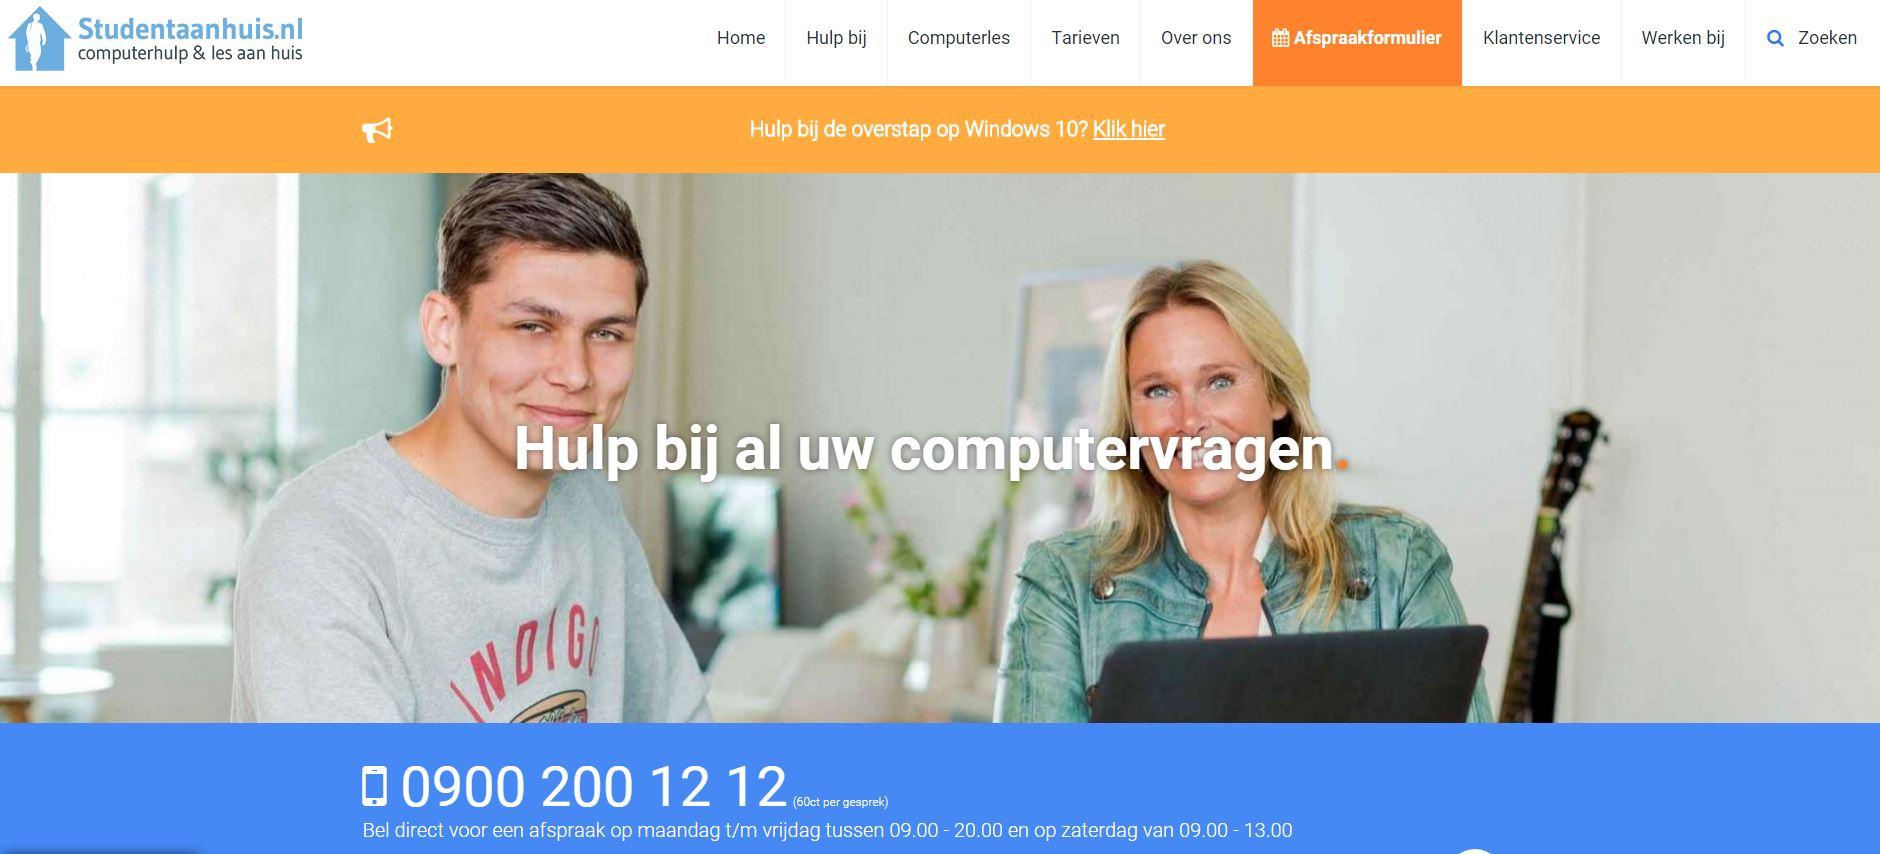 Studentaanhuis.nl